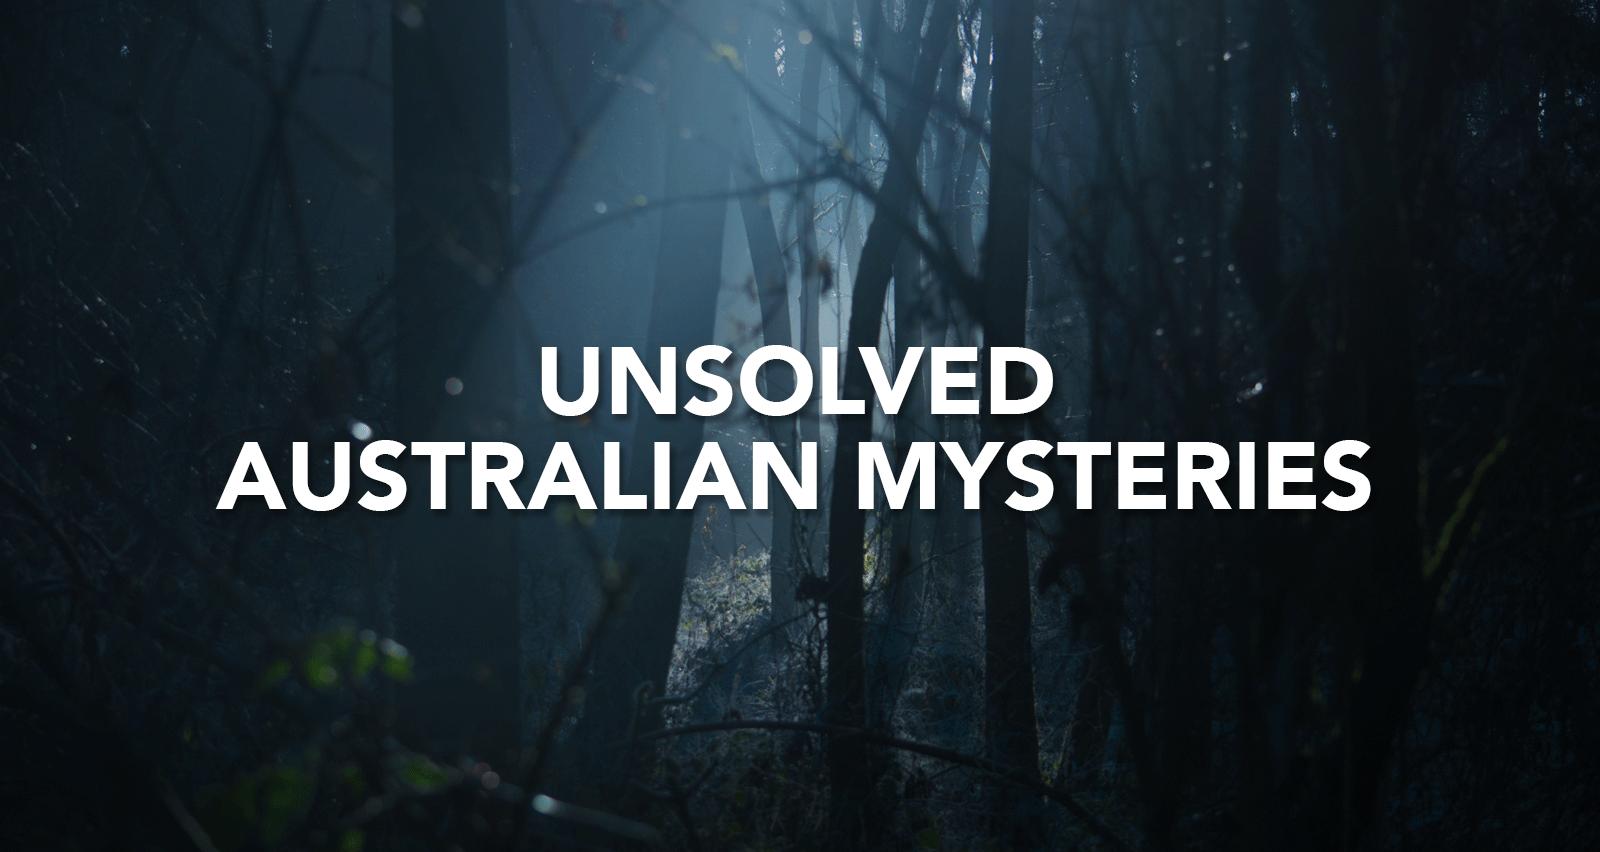 Australian Unsolved Mysteries